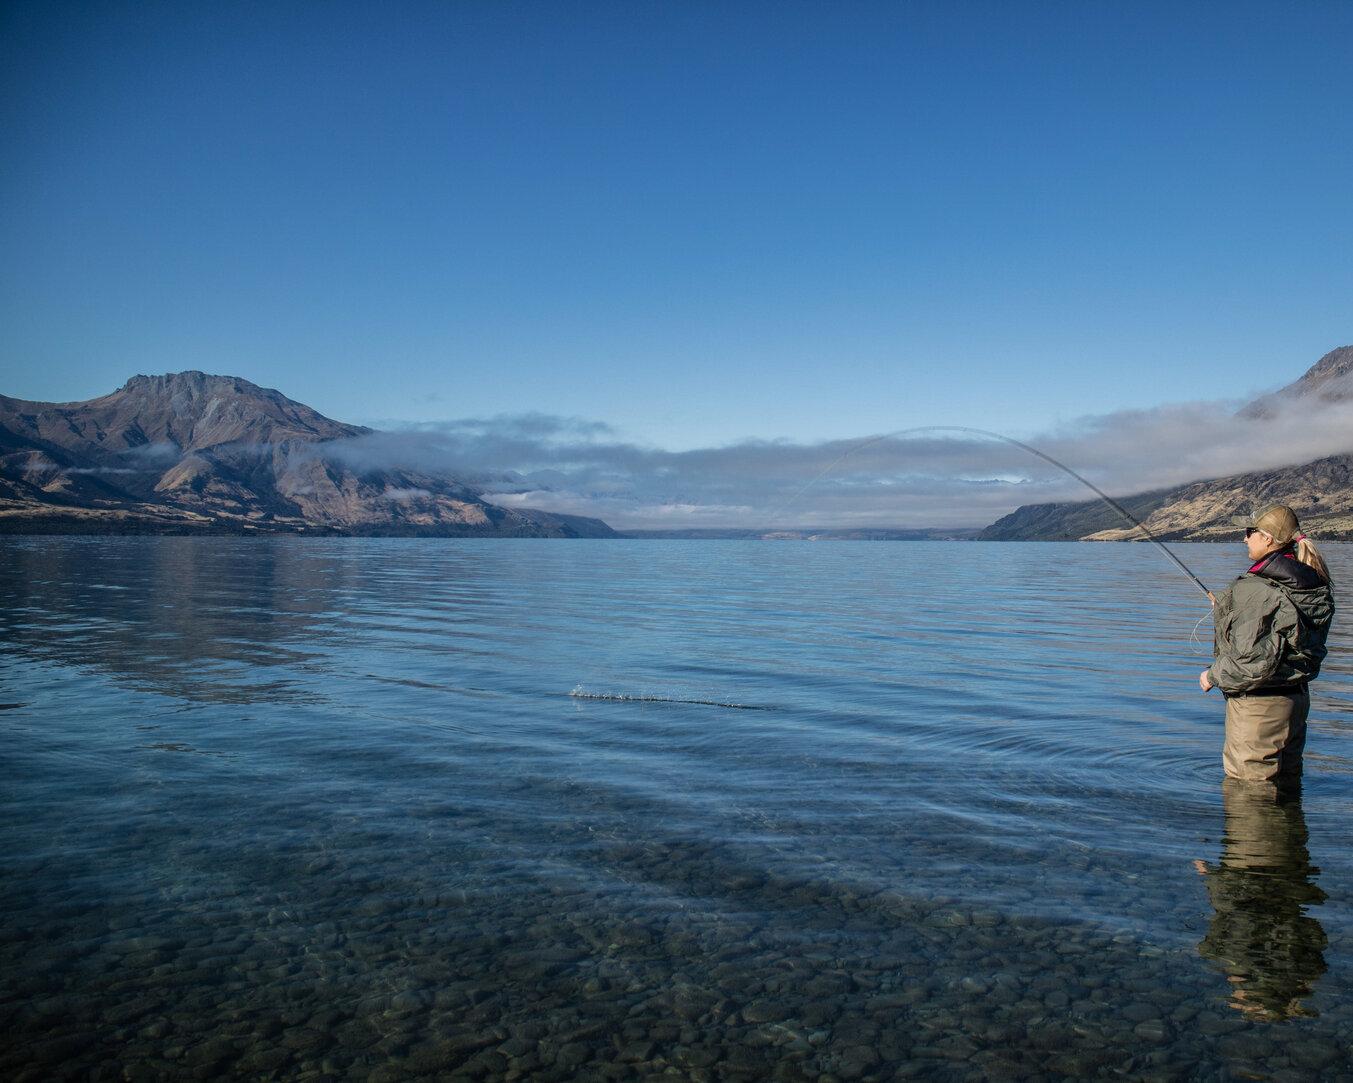 Queenstown Lake edge stalking on Lake Wakatipu. The lake of the sleeping giant  Todd Adolph